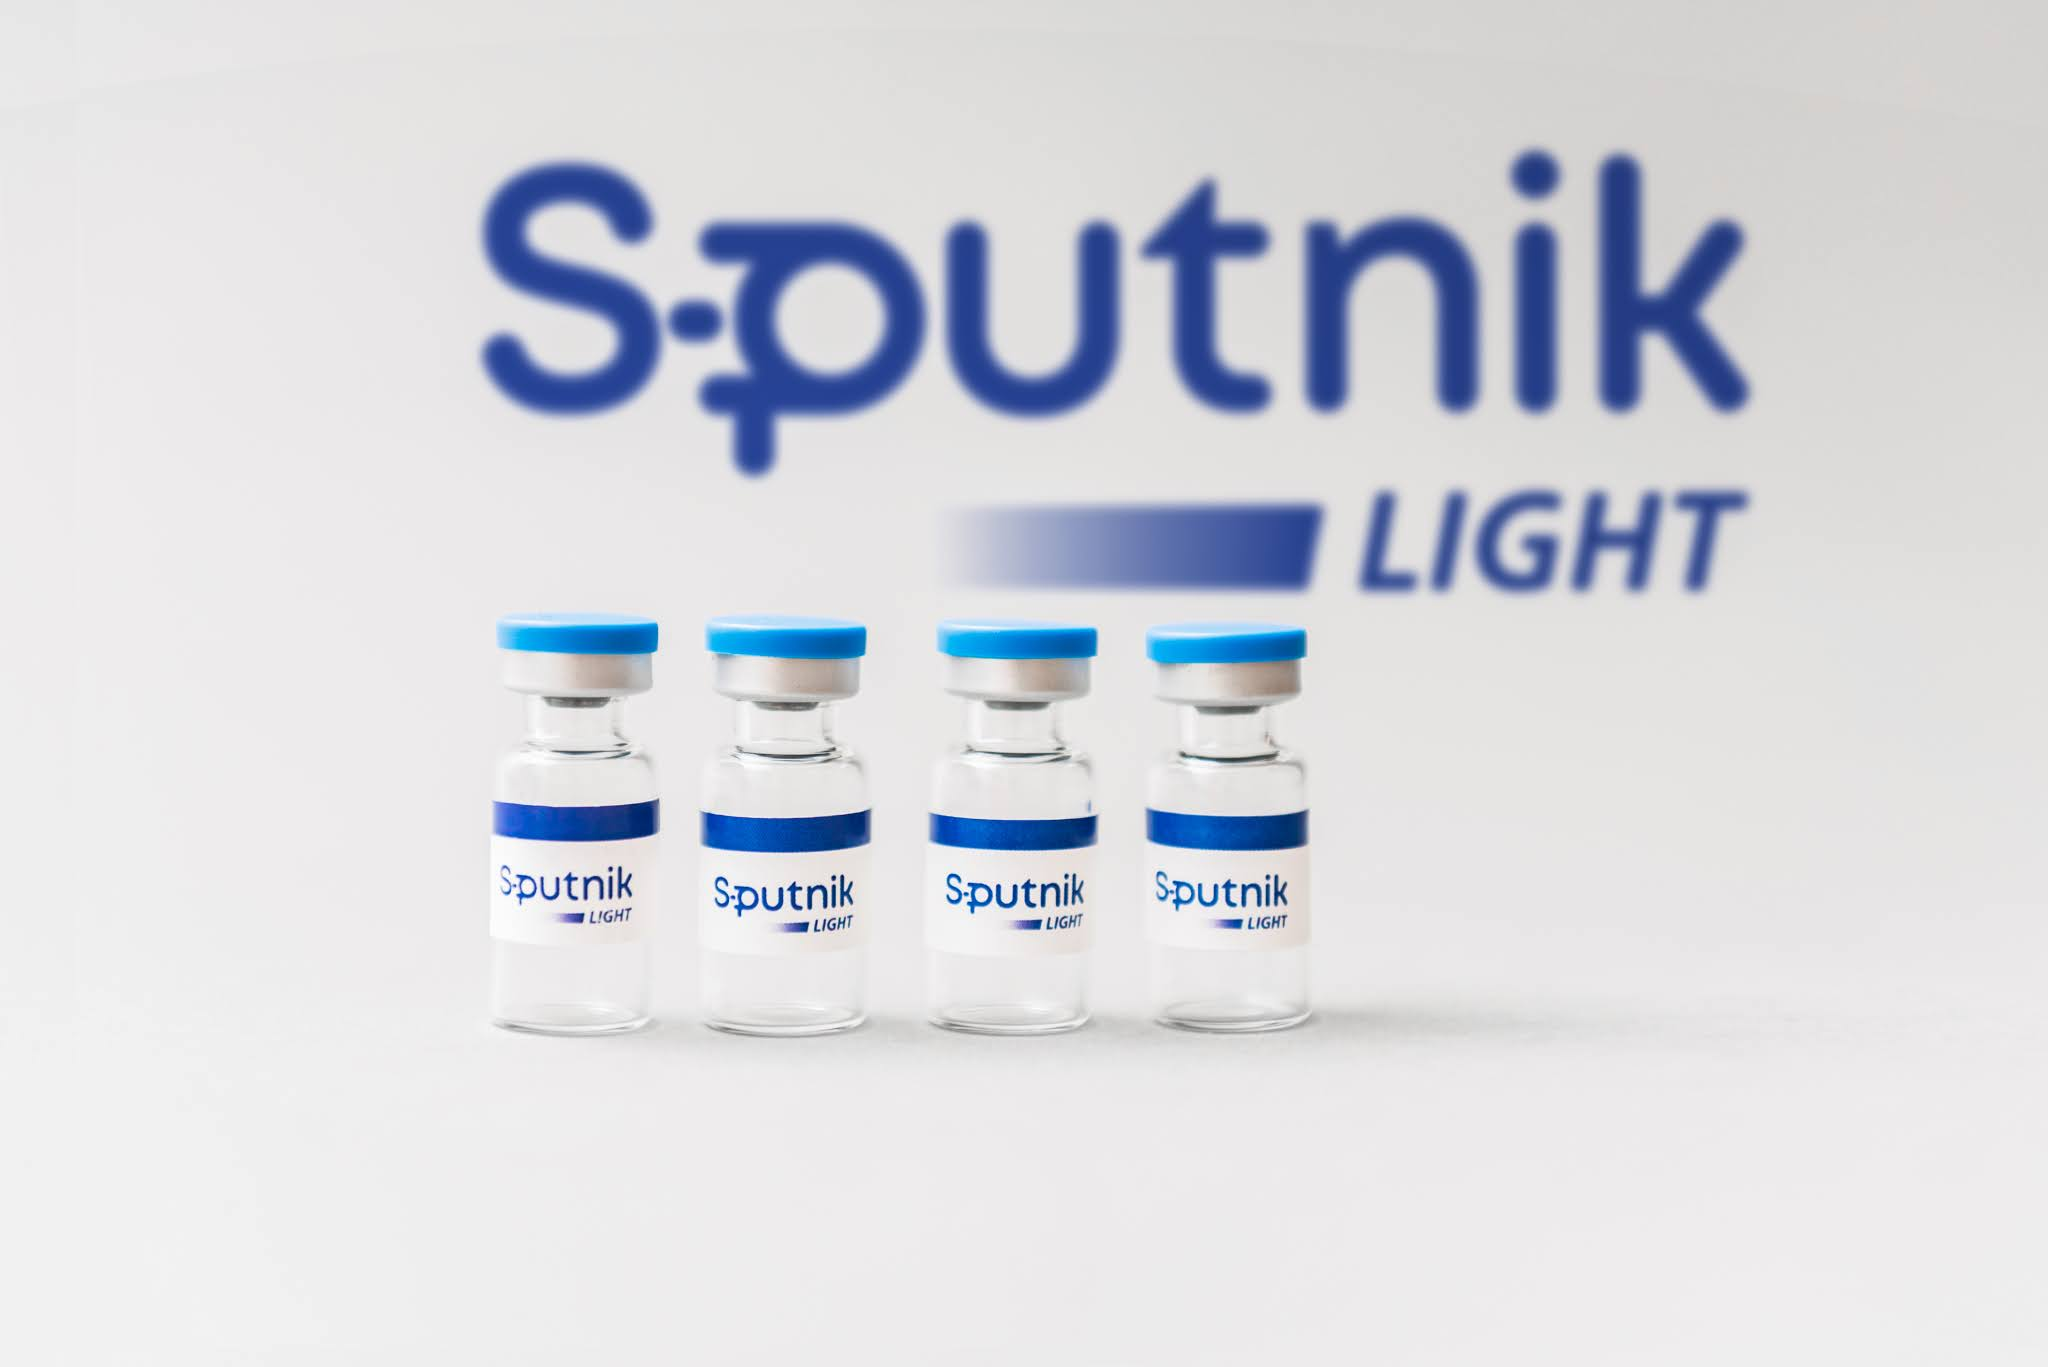 Rusia registra la vacuna Sputnik Light de una sola dosis contra el coronavirus